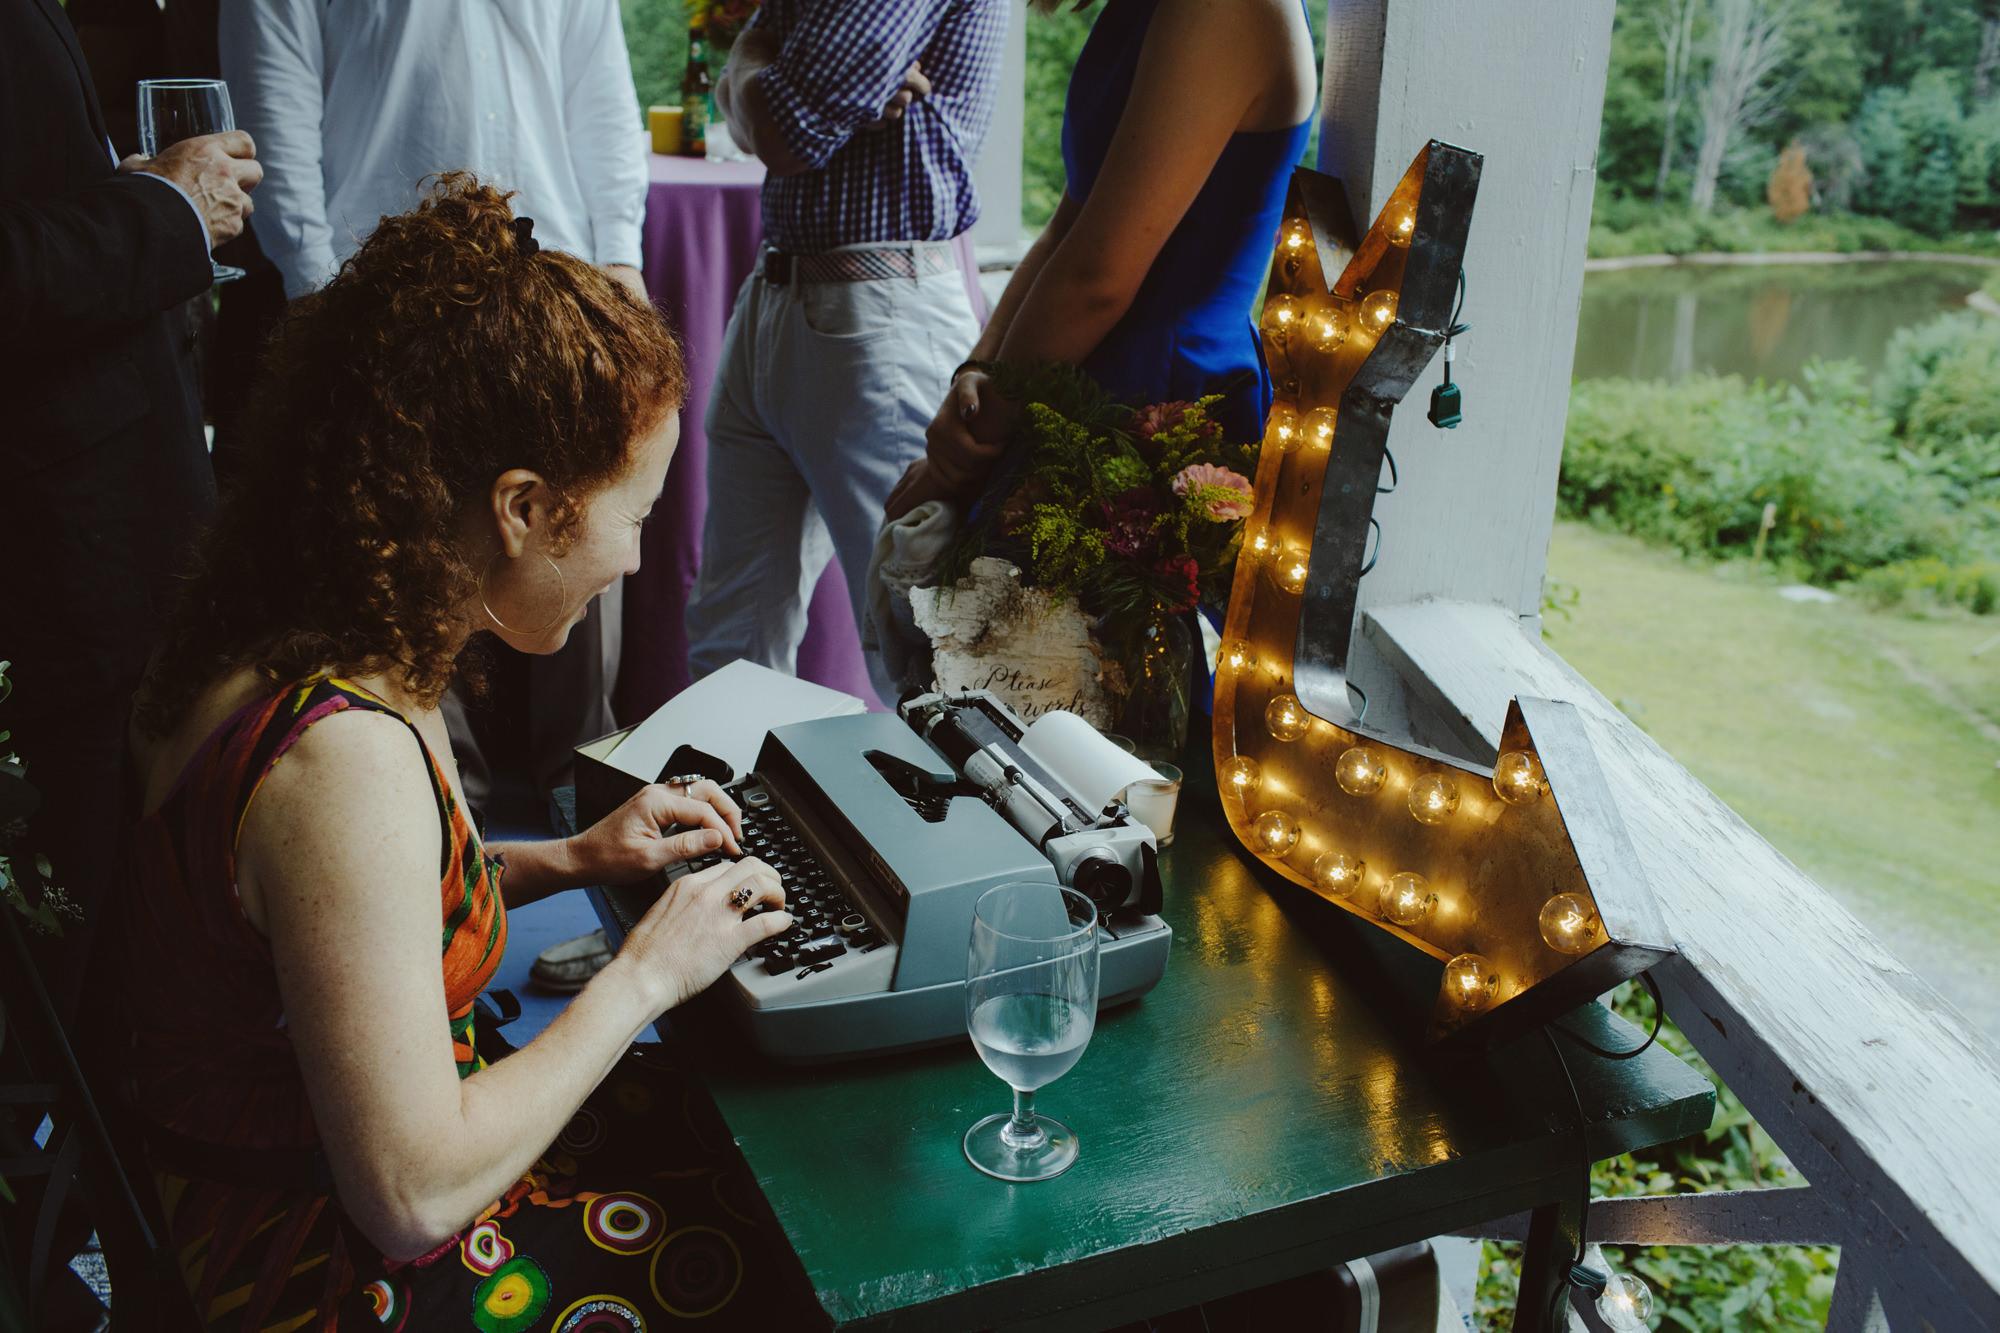 catskills_big_indian_springs_upstate_NY_wedding_sammblake030.jpg